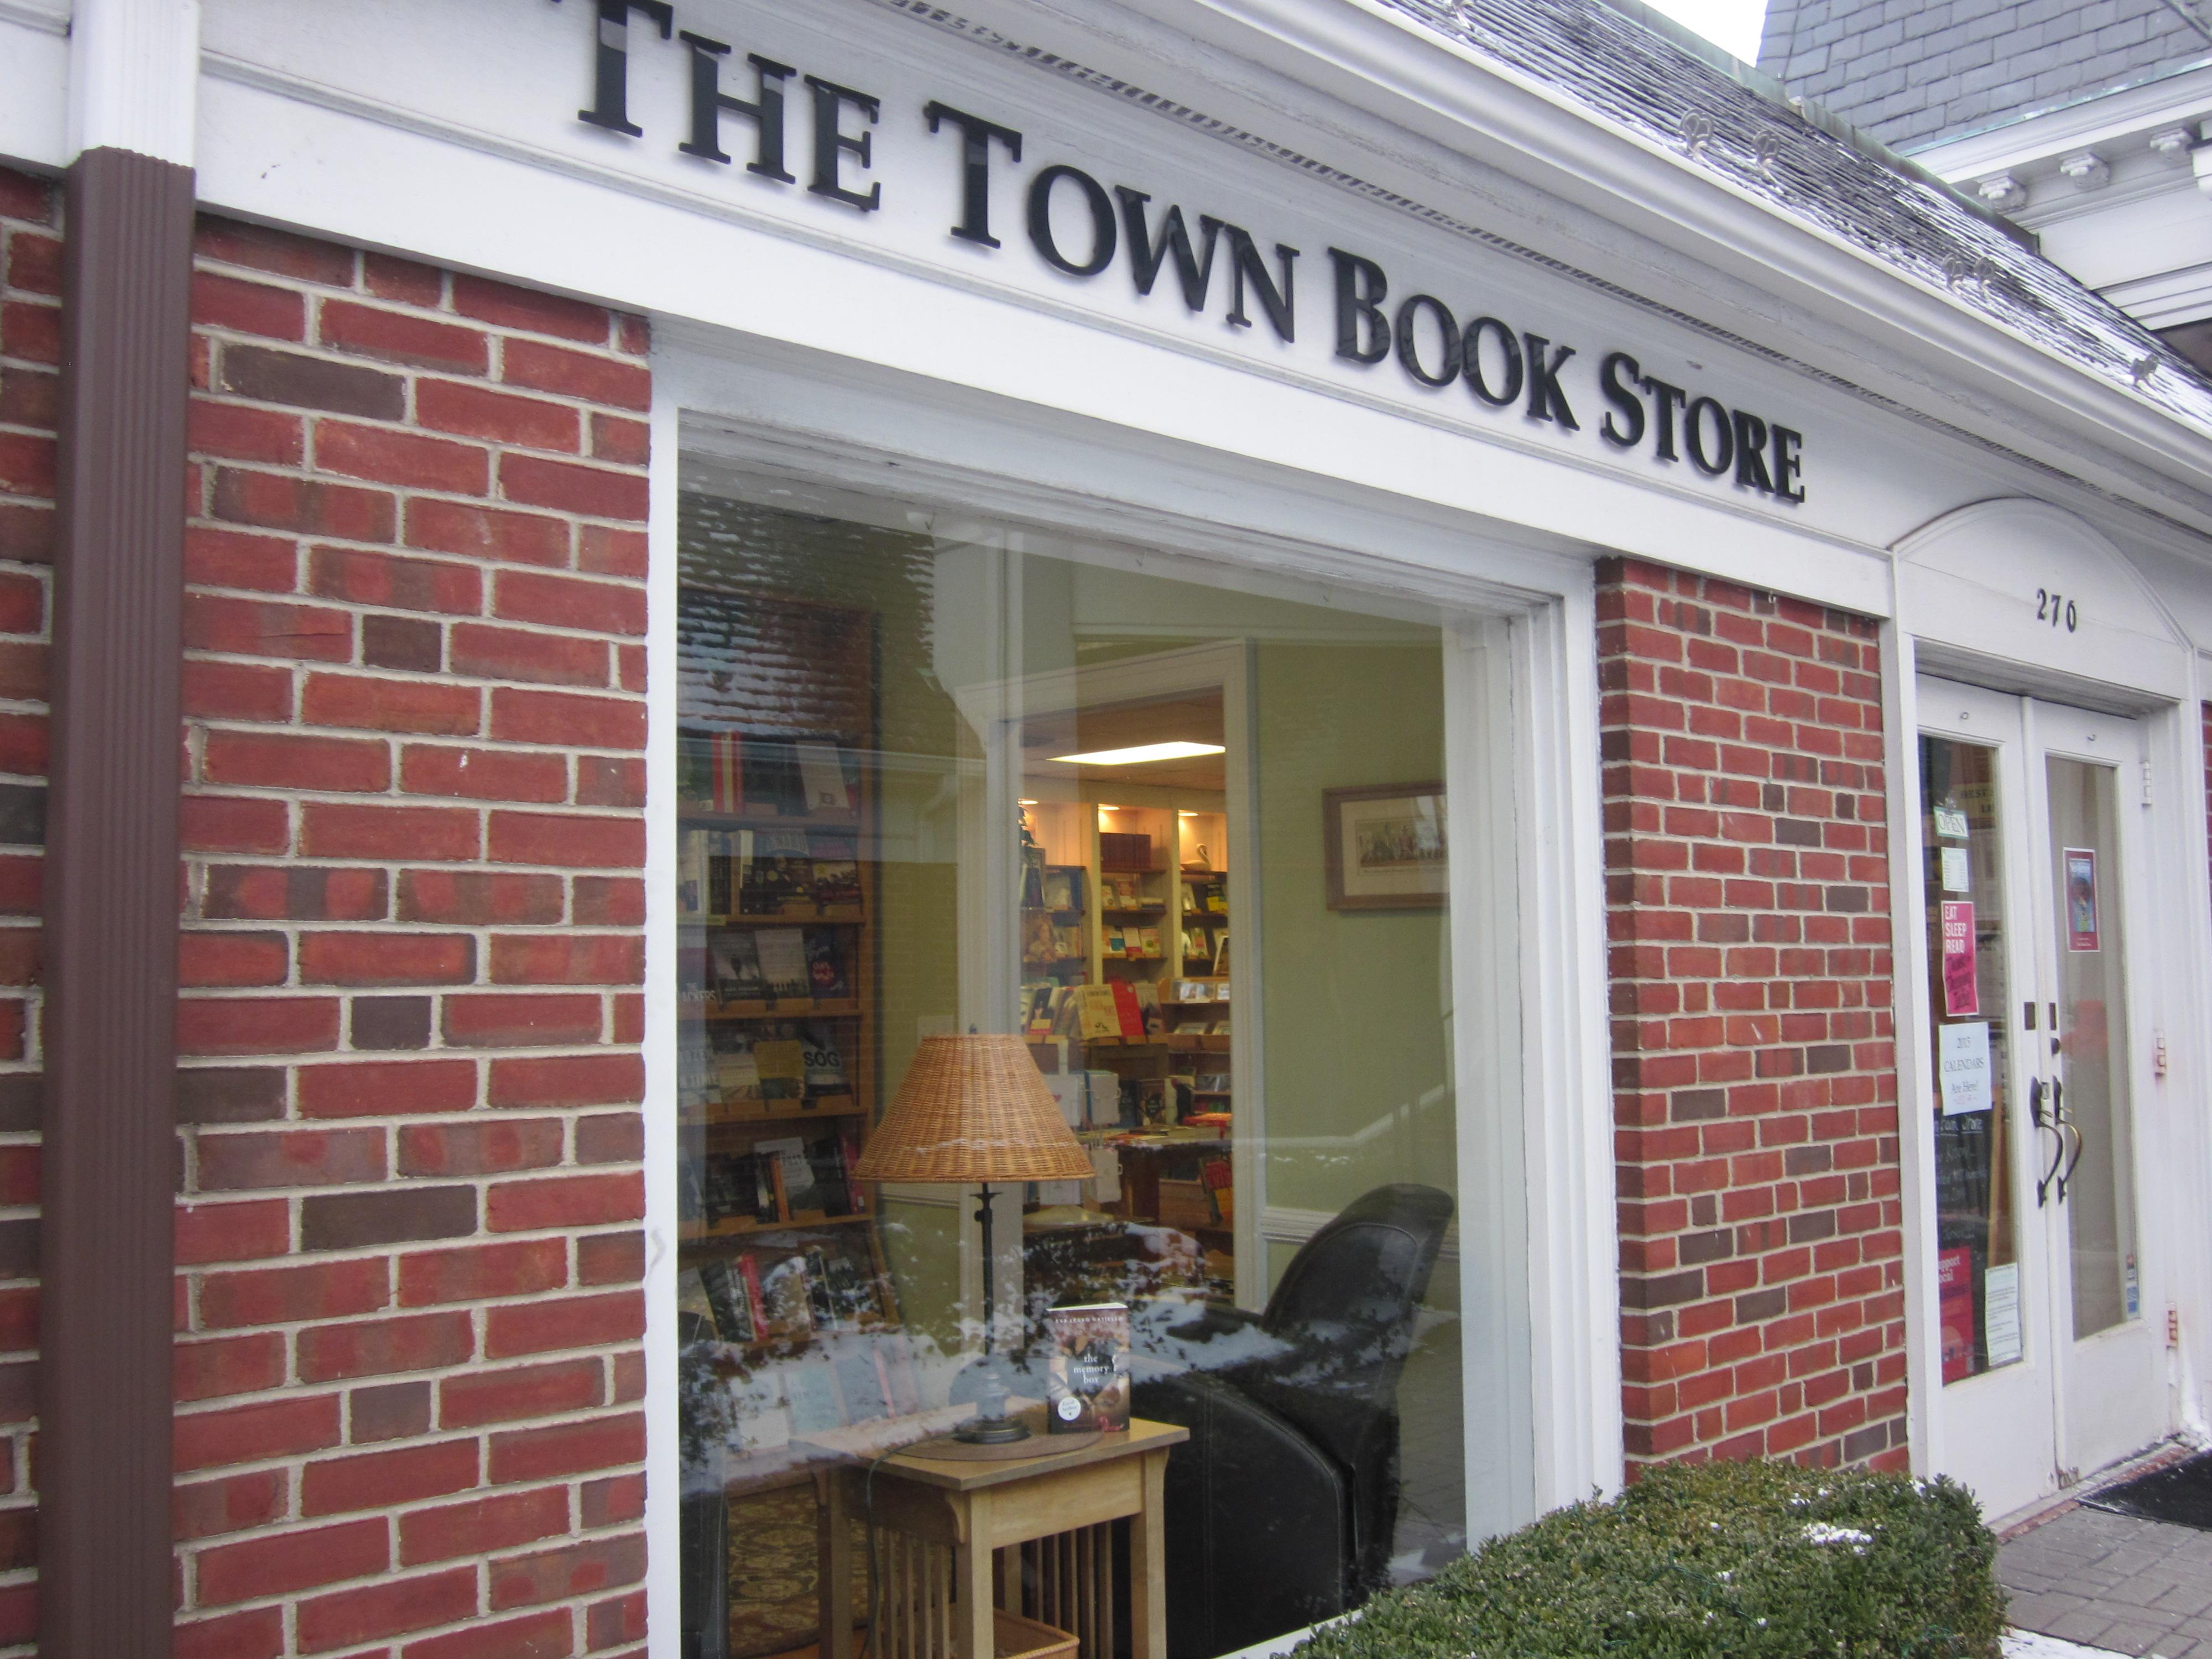 townbookstore-westfield-nj